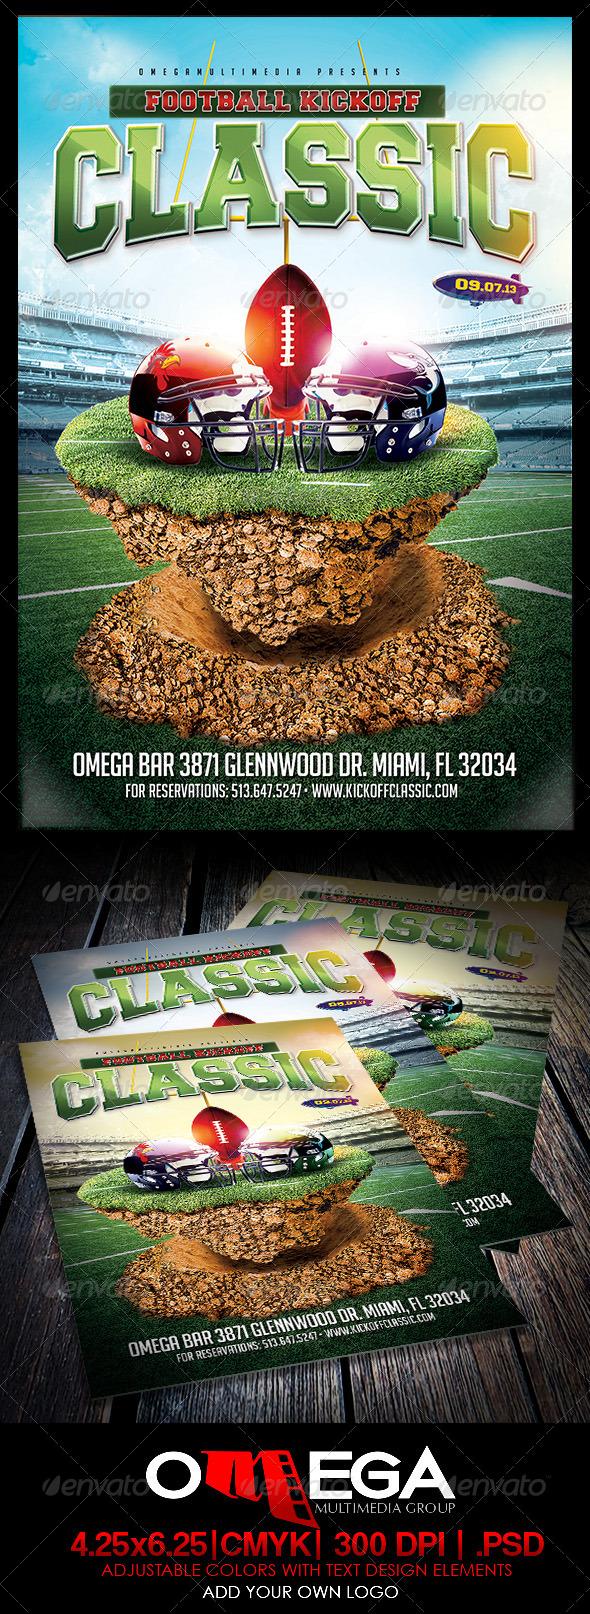 GraphicRiver Football Kickoff Classic 5565007